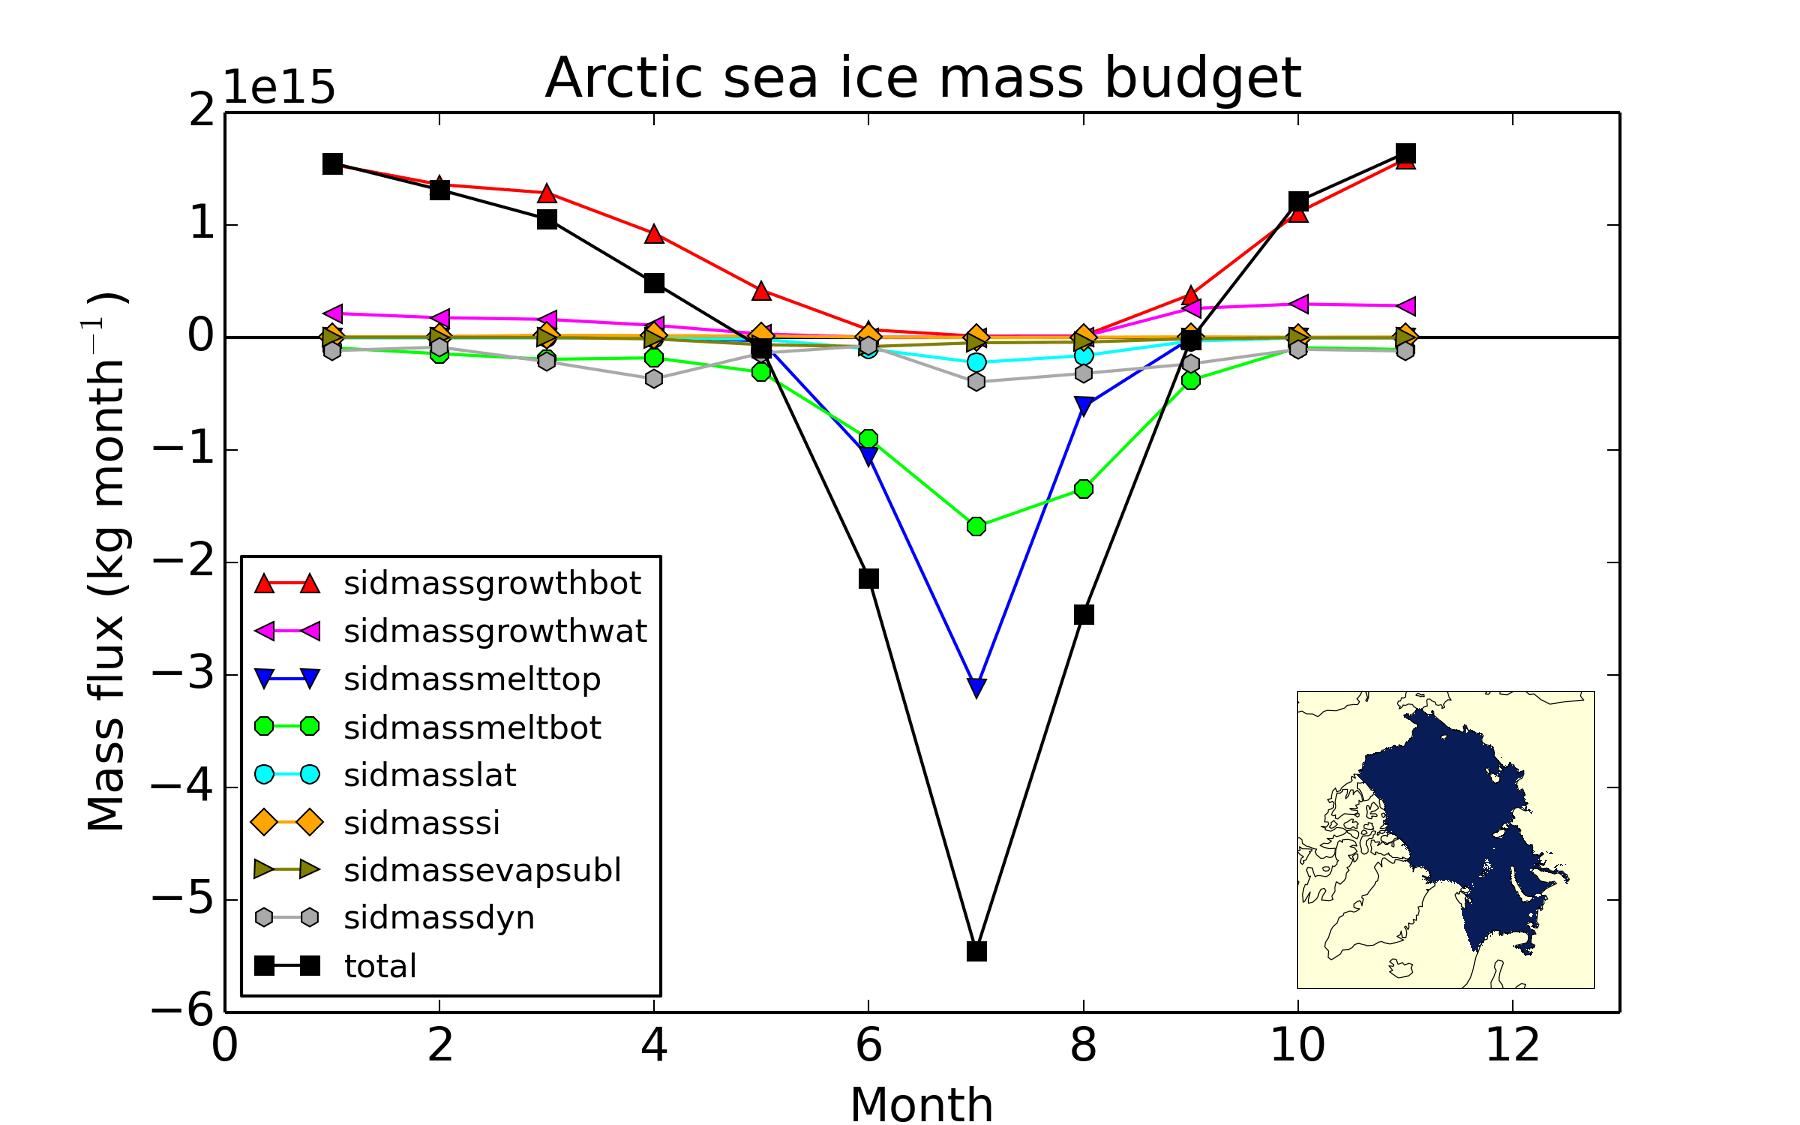 arctic_sea_ice_mass_budget